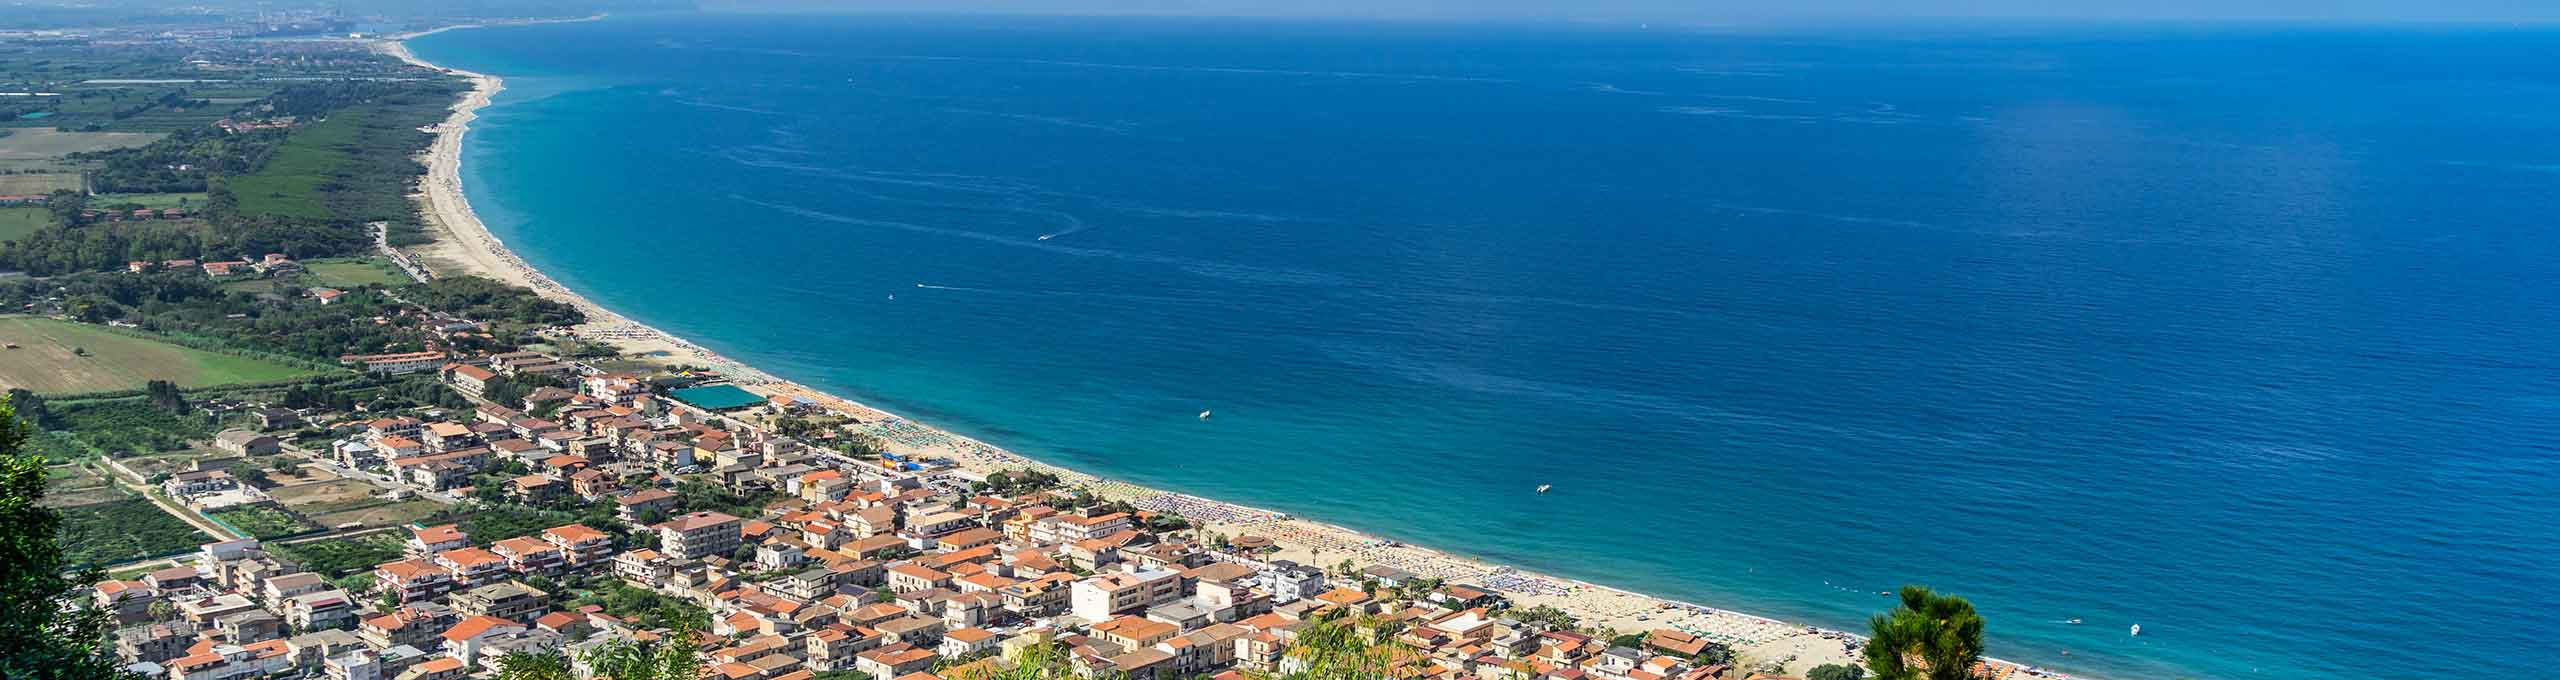 Nicotera, Costa degli Dei, Mar Tirreno